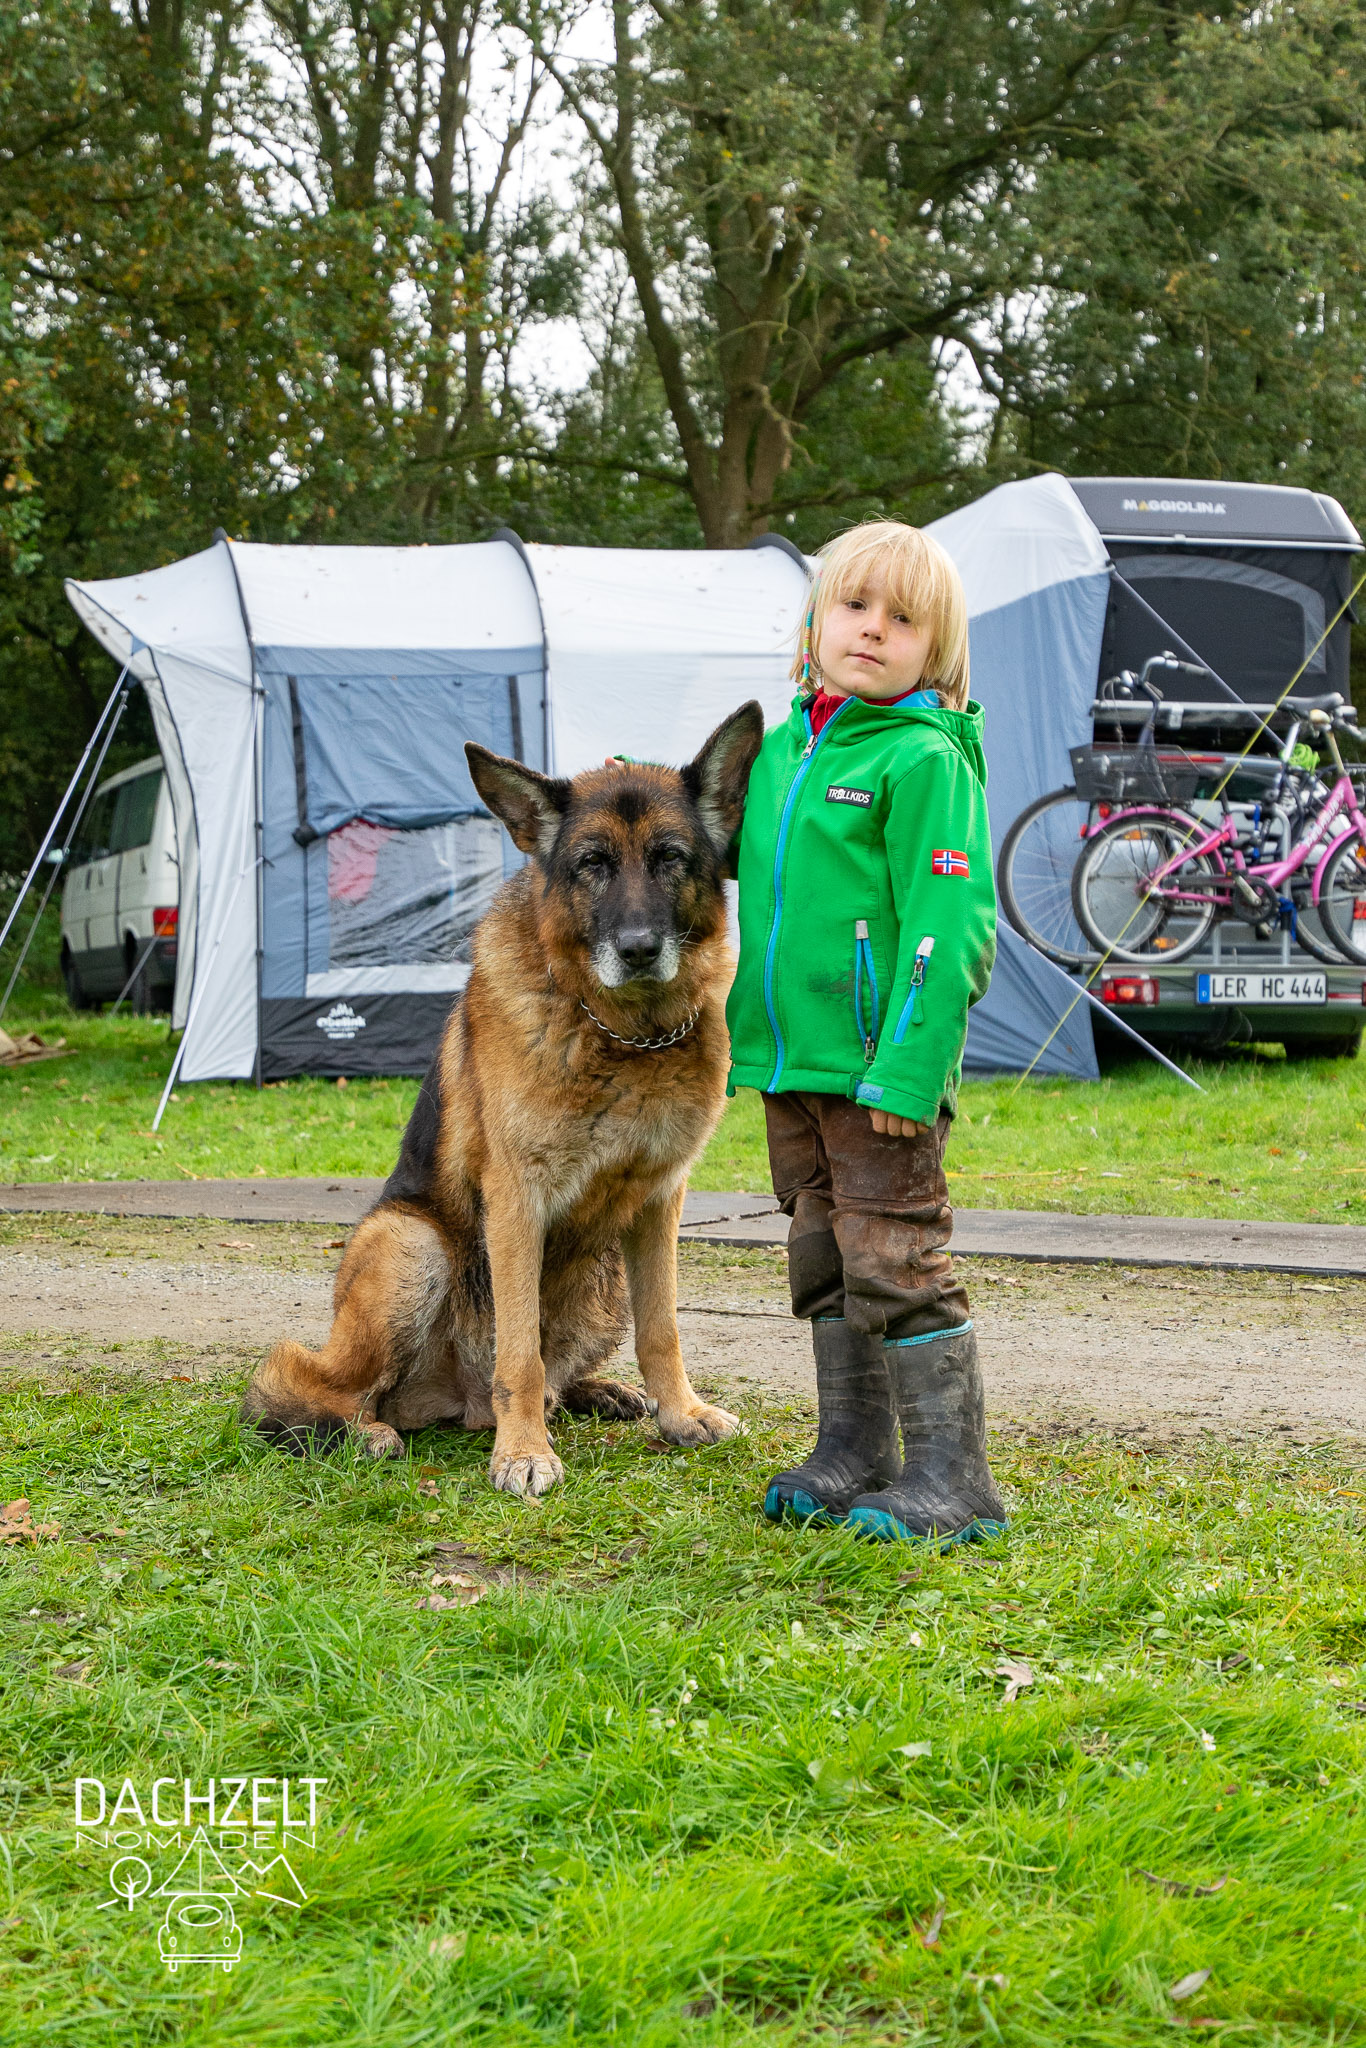 20191019-Dachzelt-Camp-Speciaal-Diana-Schandwinkel-DSC08776